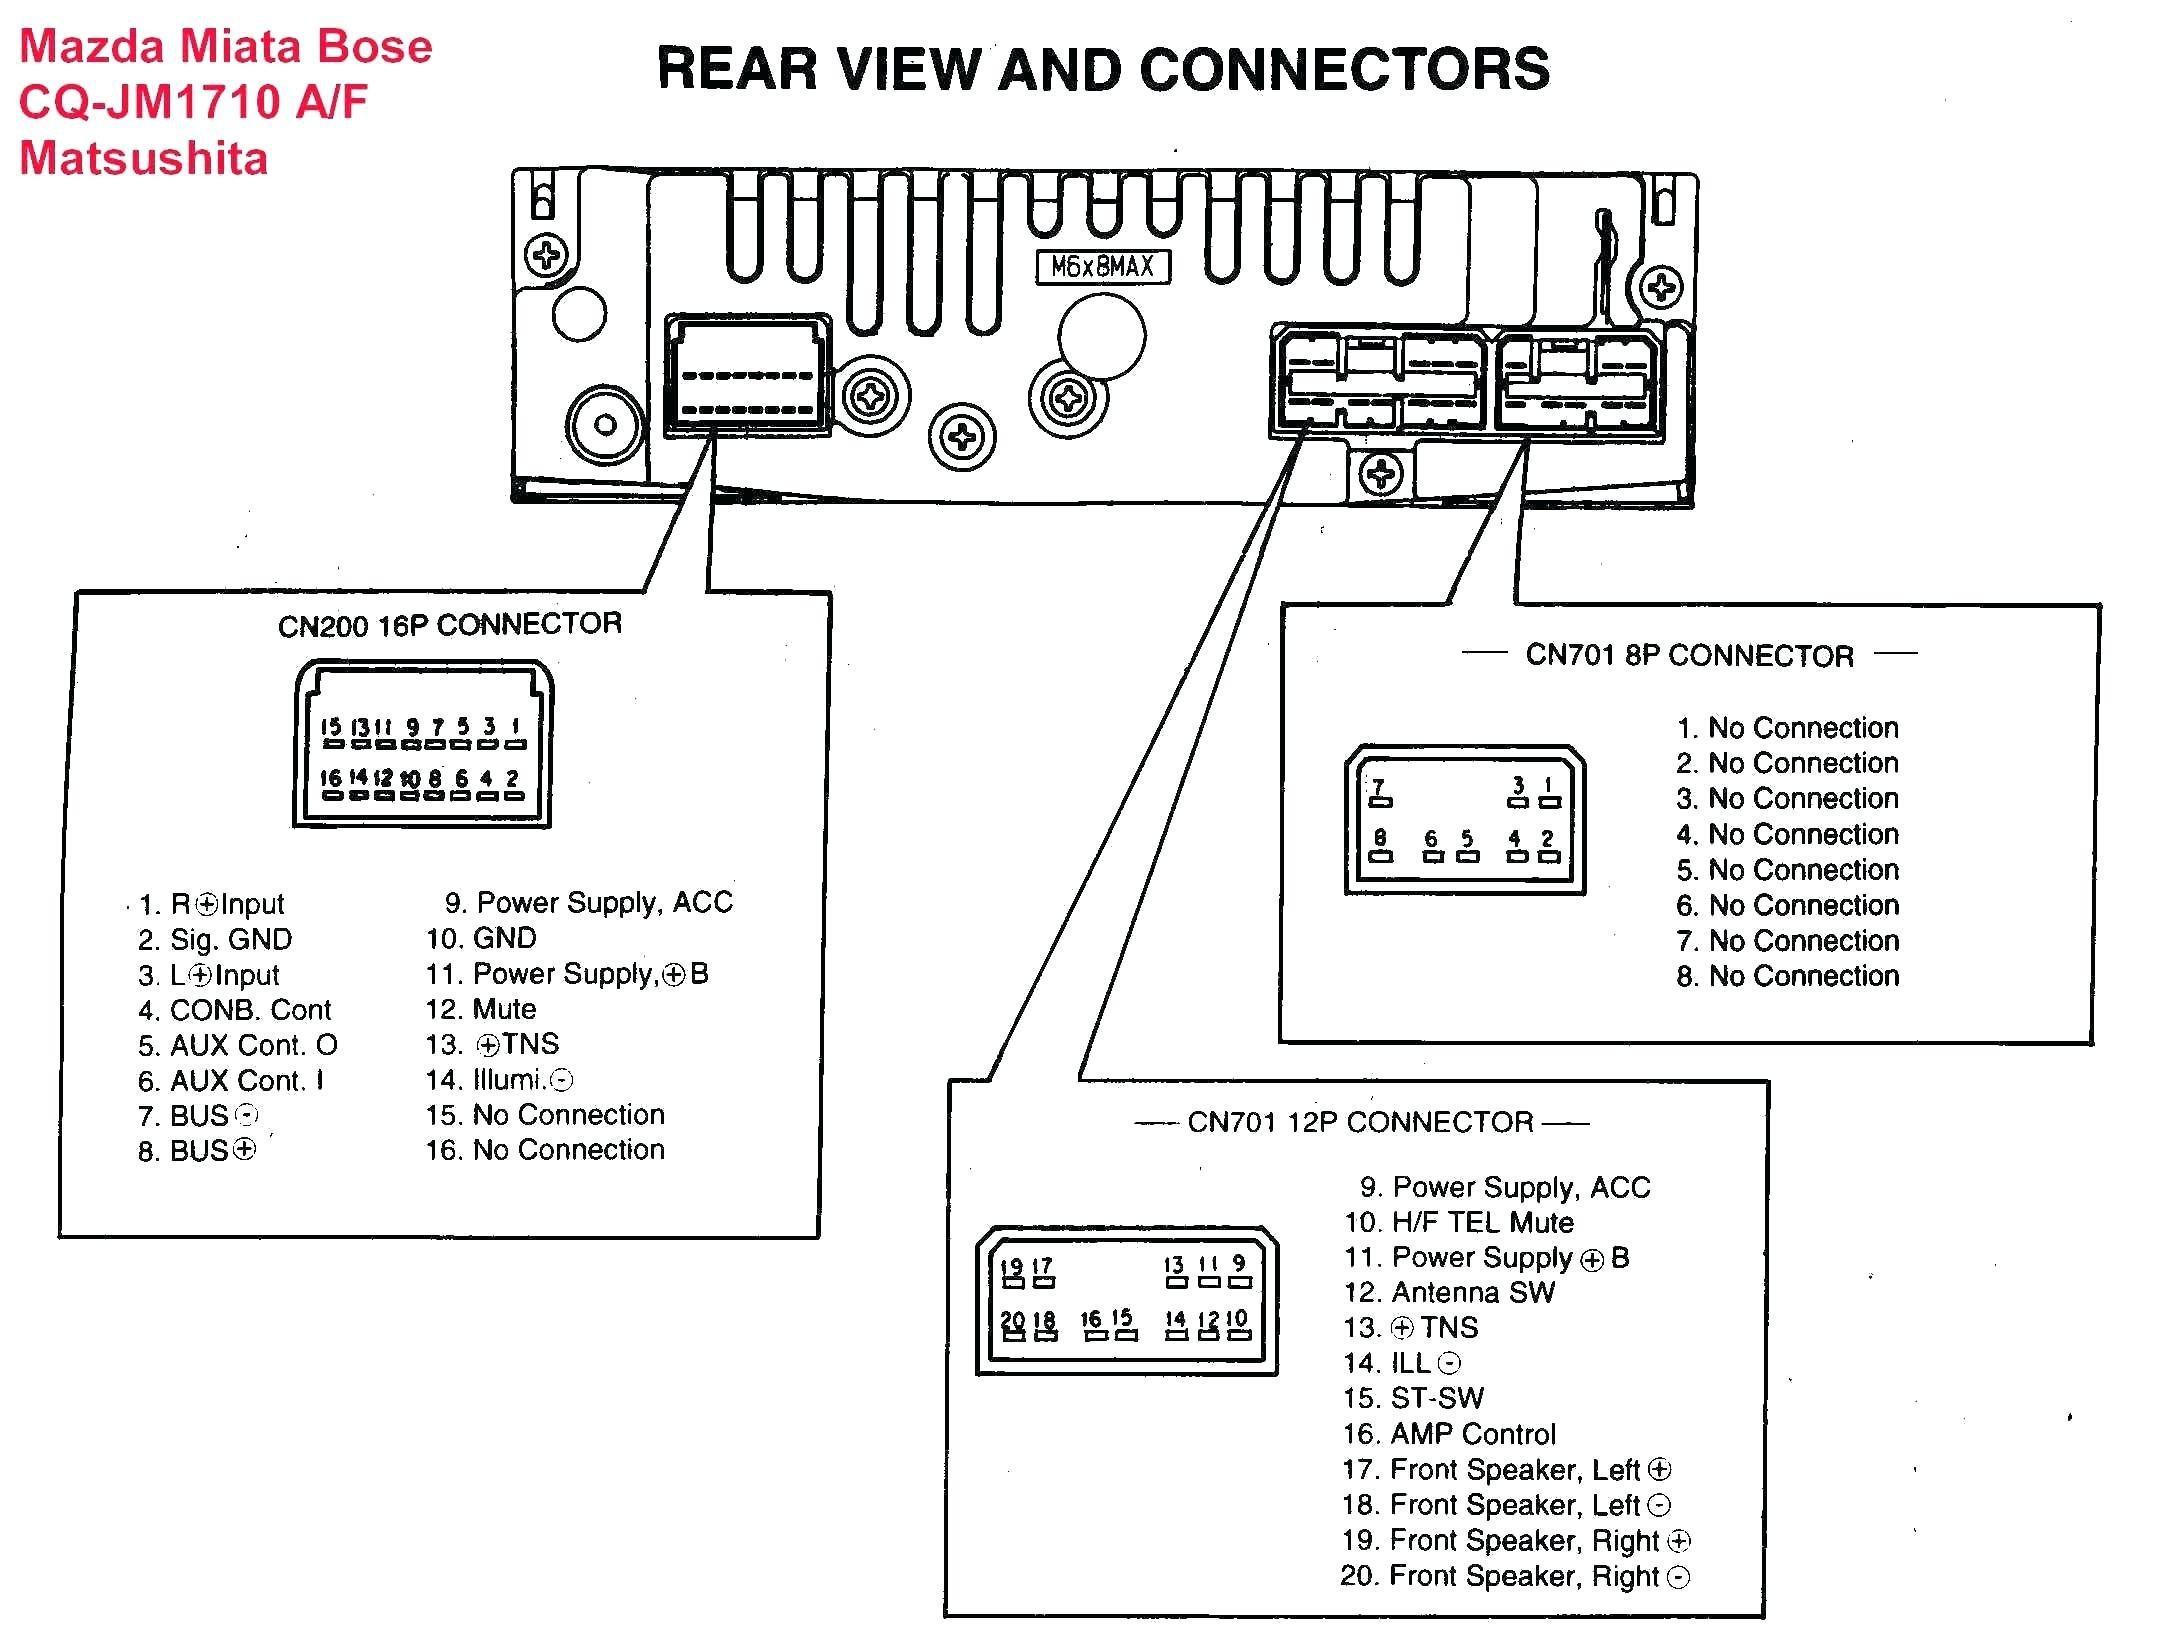 Wiring Diagram for sony Xplod Car Stereo Duesenberg Guitar Wiring Diagram Best Awesome Wiring Diagram for Of Wiring Diagram for sony Xplod Car Stereo